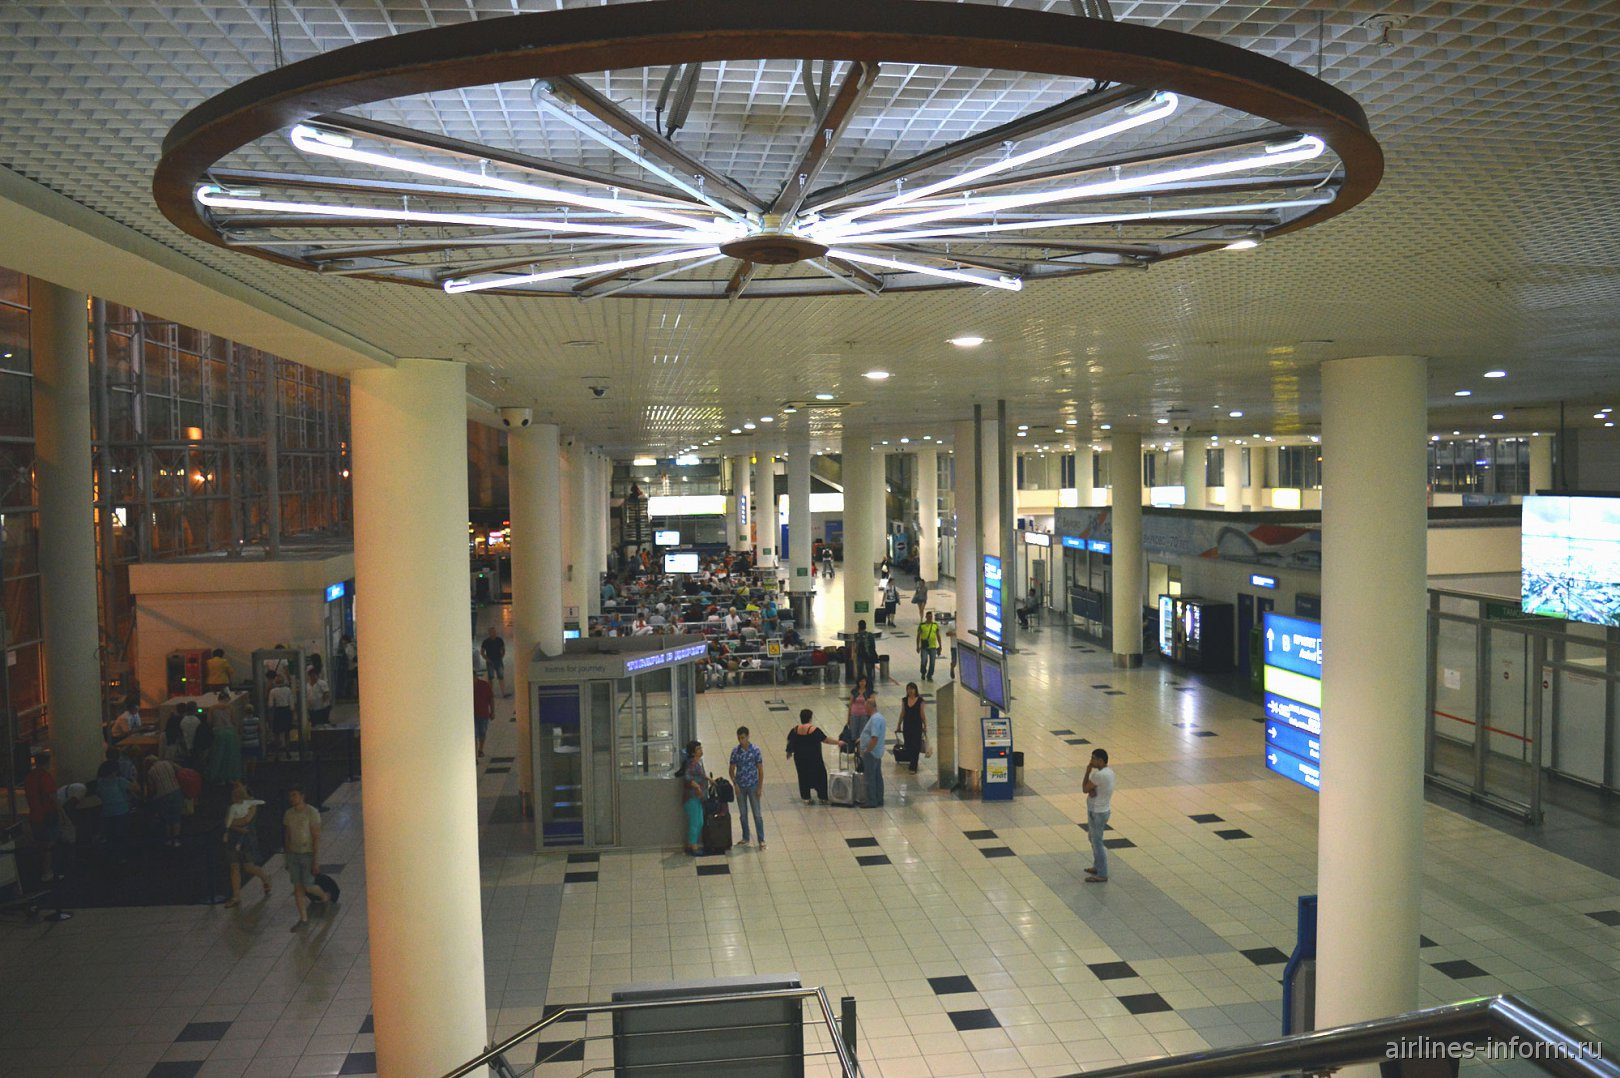 В терминале B аэропорта Москва Внуково